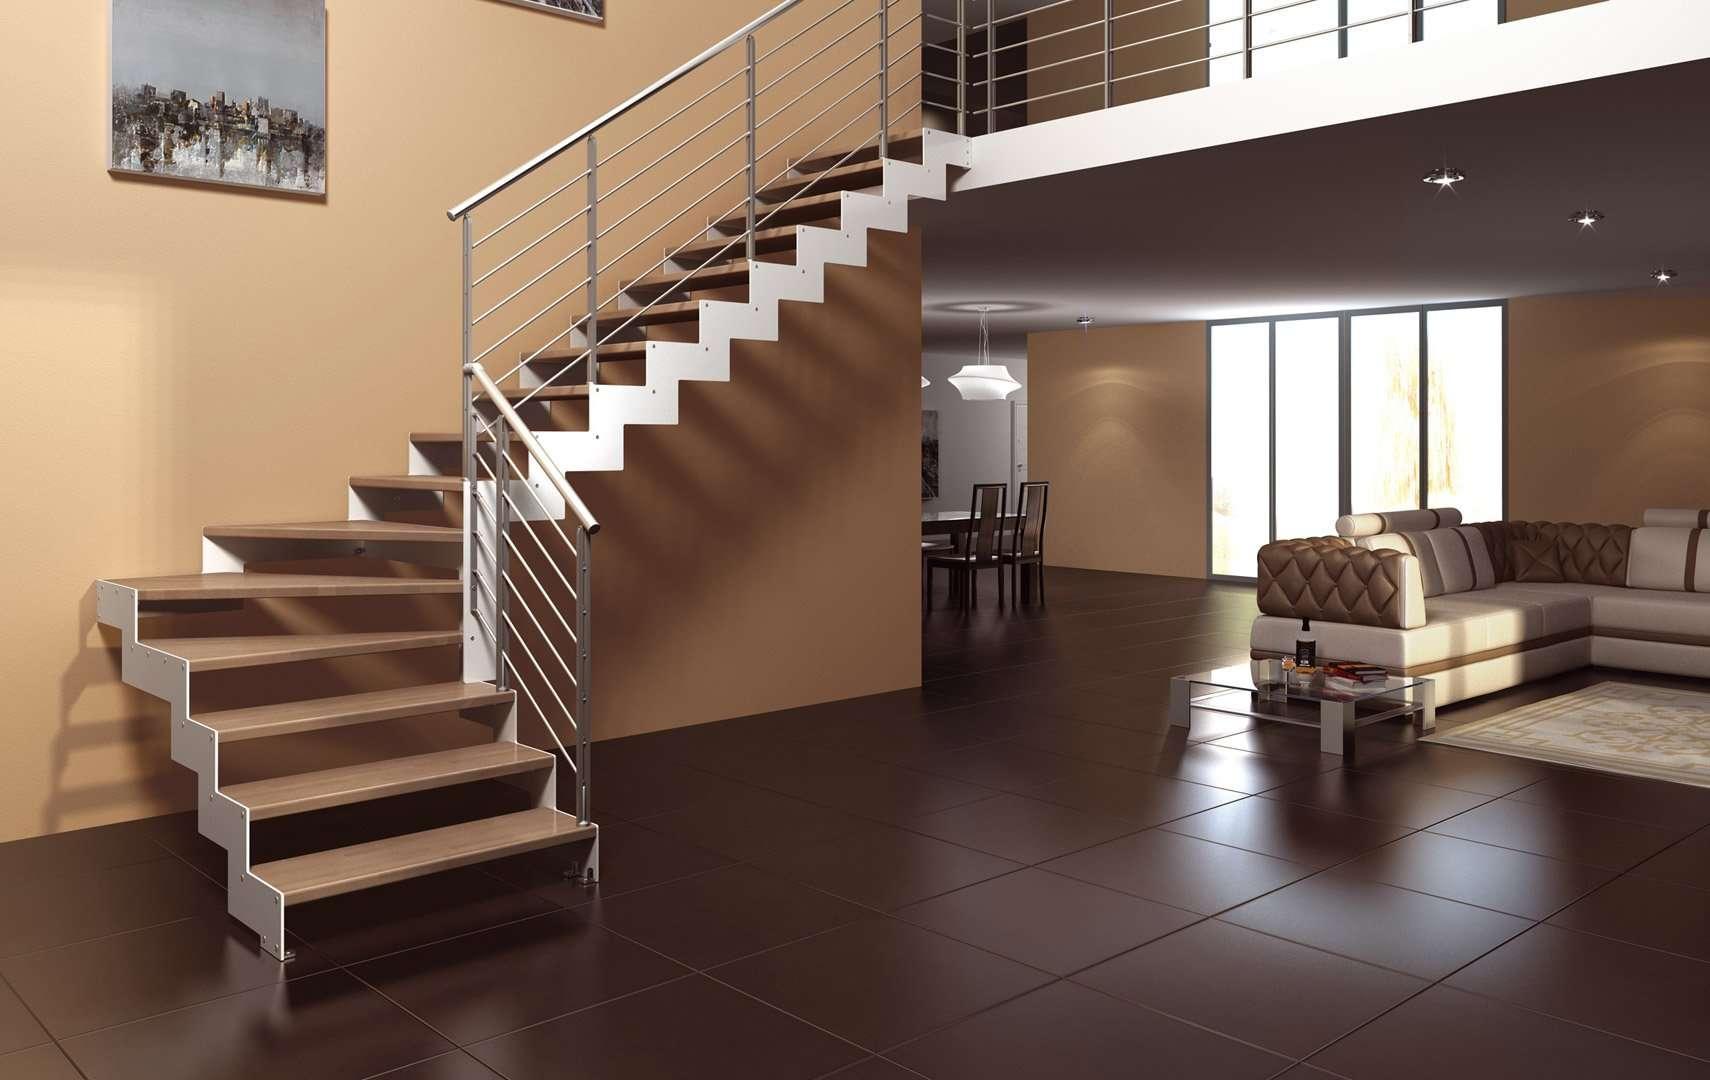 Escaleras de madera para interiores escalera interior - Escaleras de madera para interiores ...